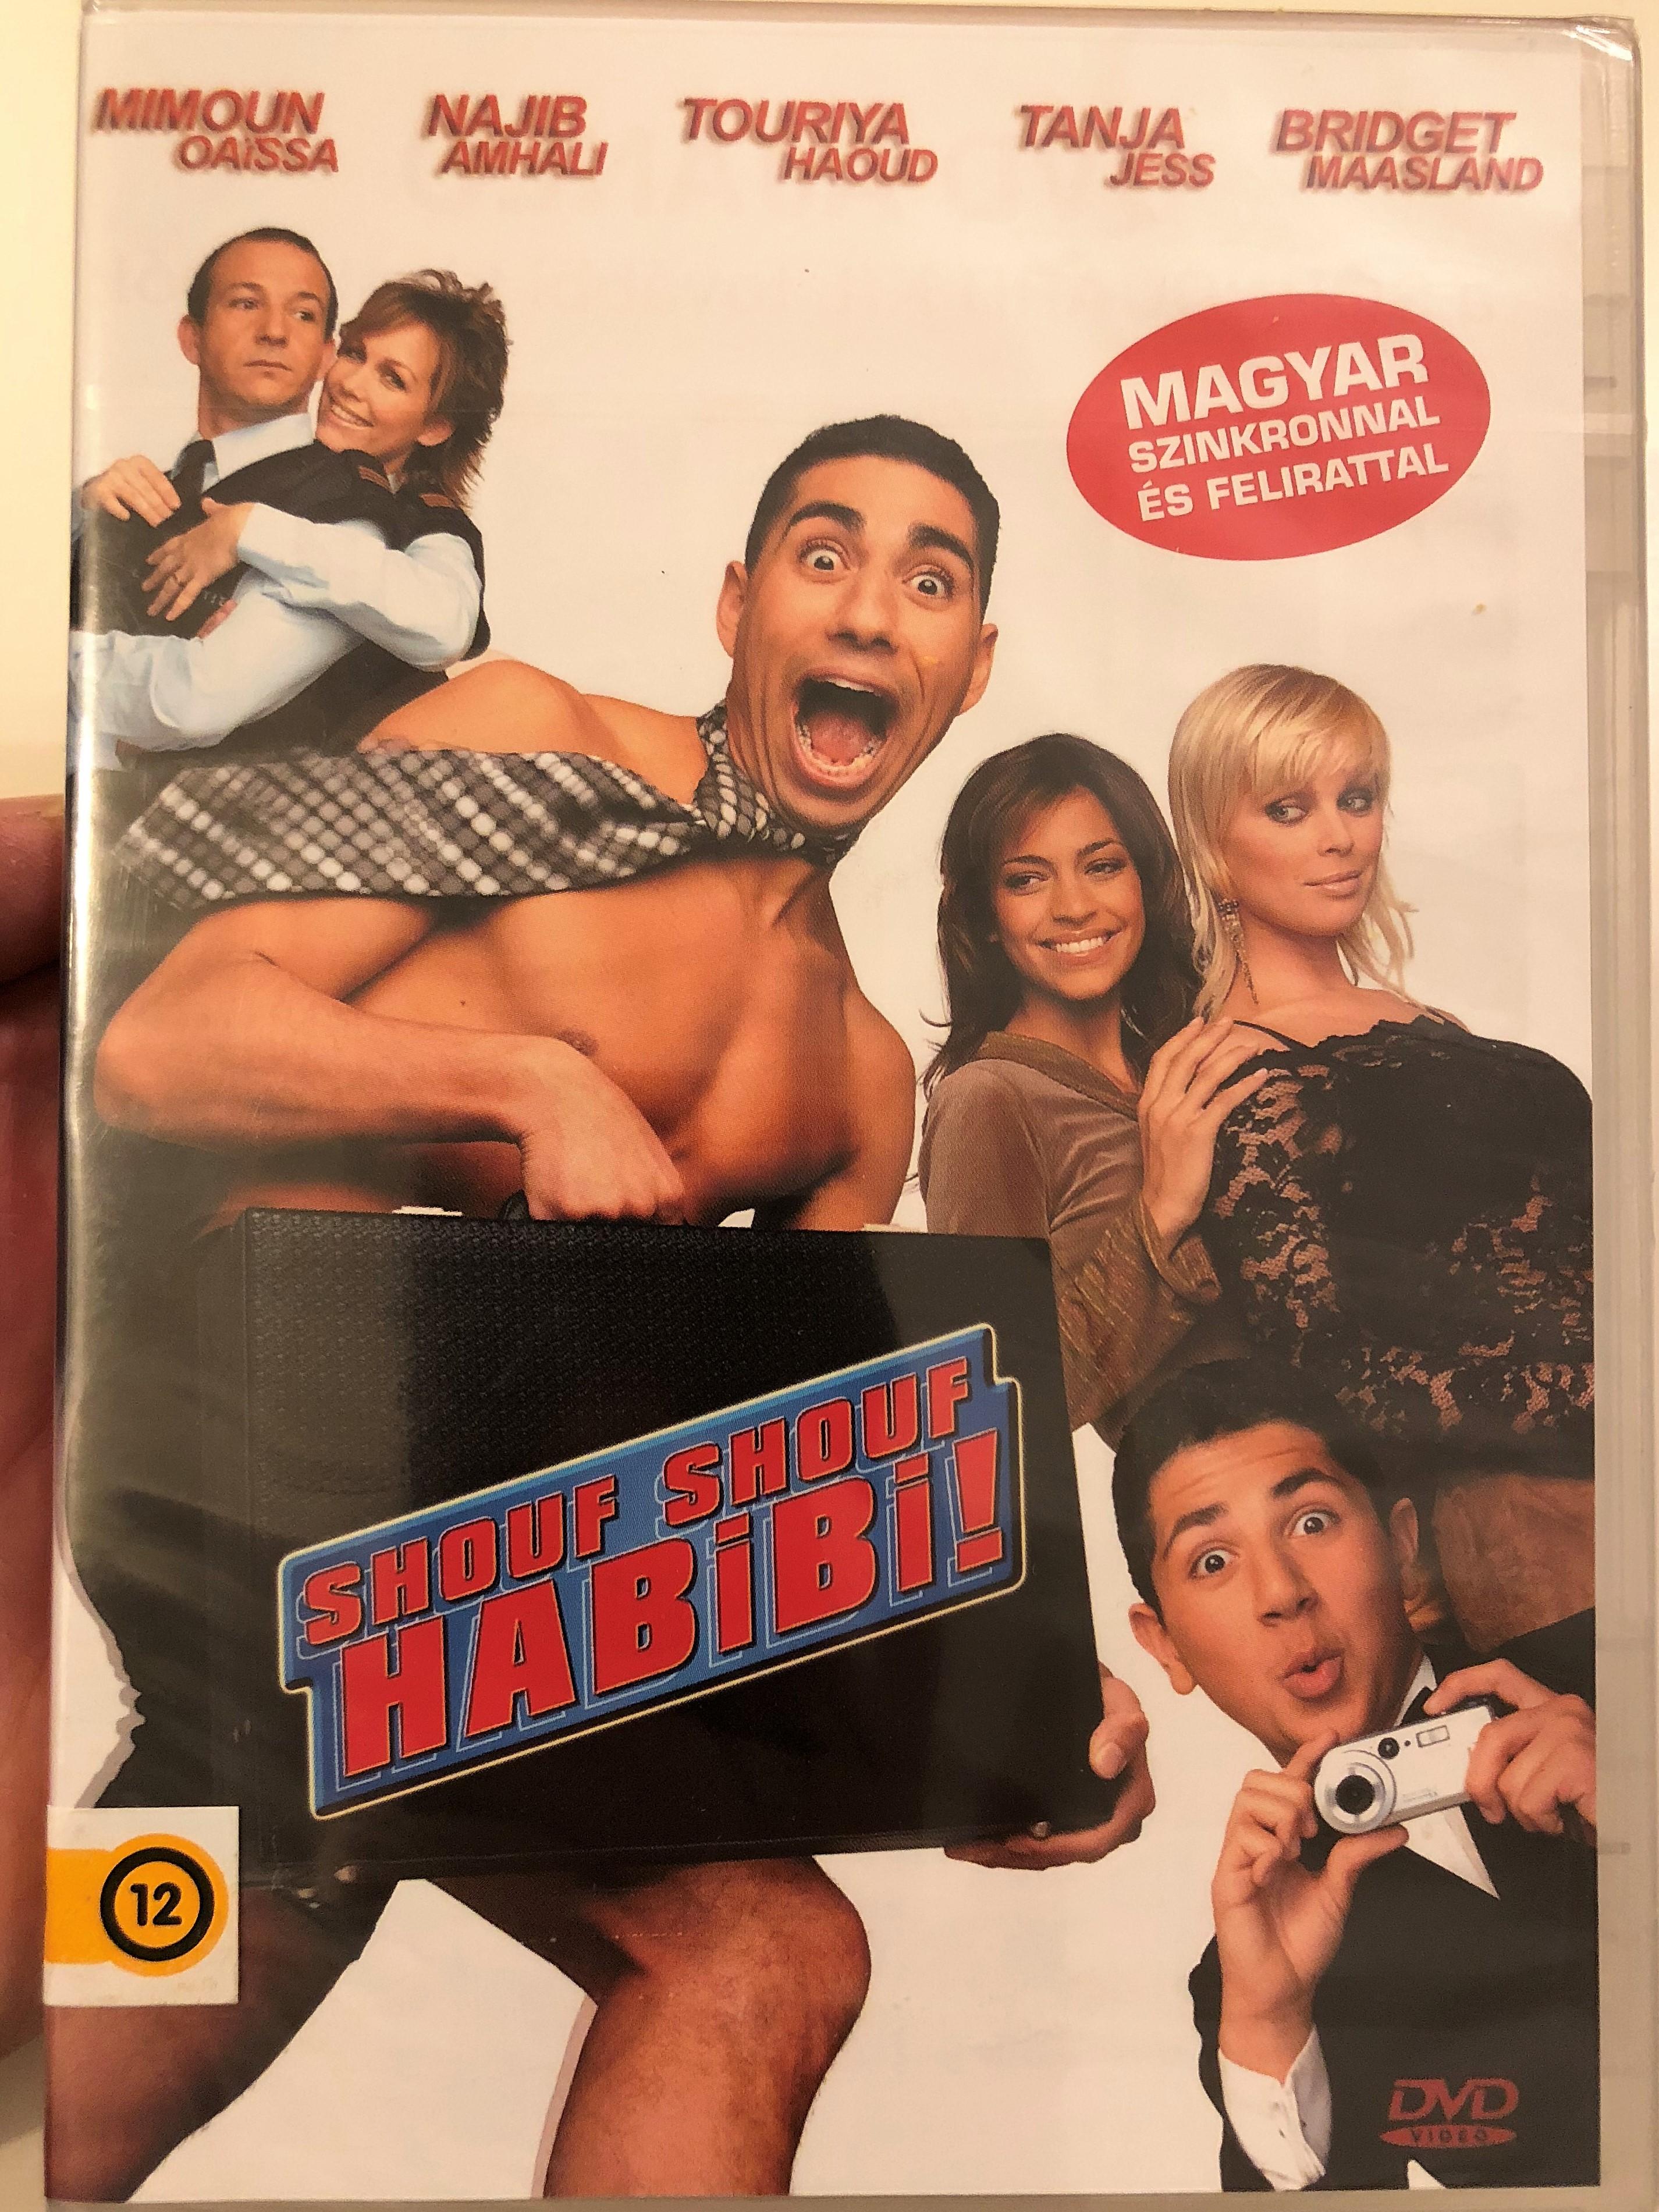 shouf-shouf-habibi-dvd-2004-hush-hush-baby-directed-by-albert-ter-heerdt-starring-mimoun-oa-ssa-salah-eddine-benmoussa-1-.jpg